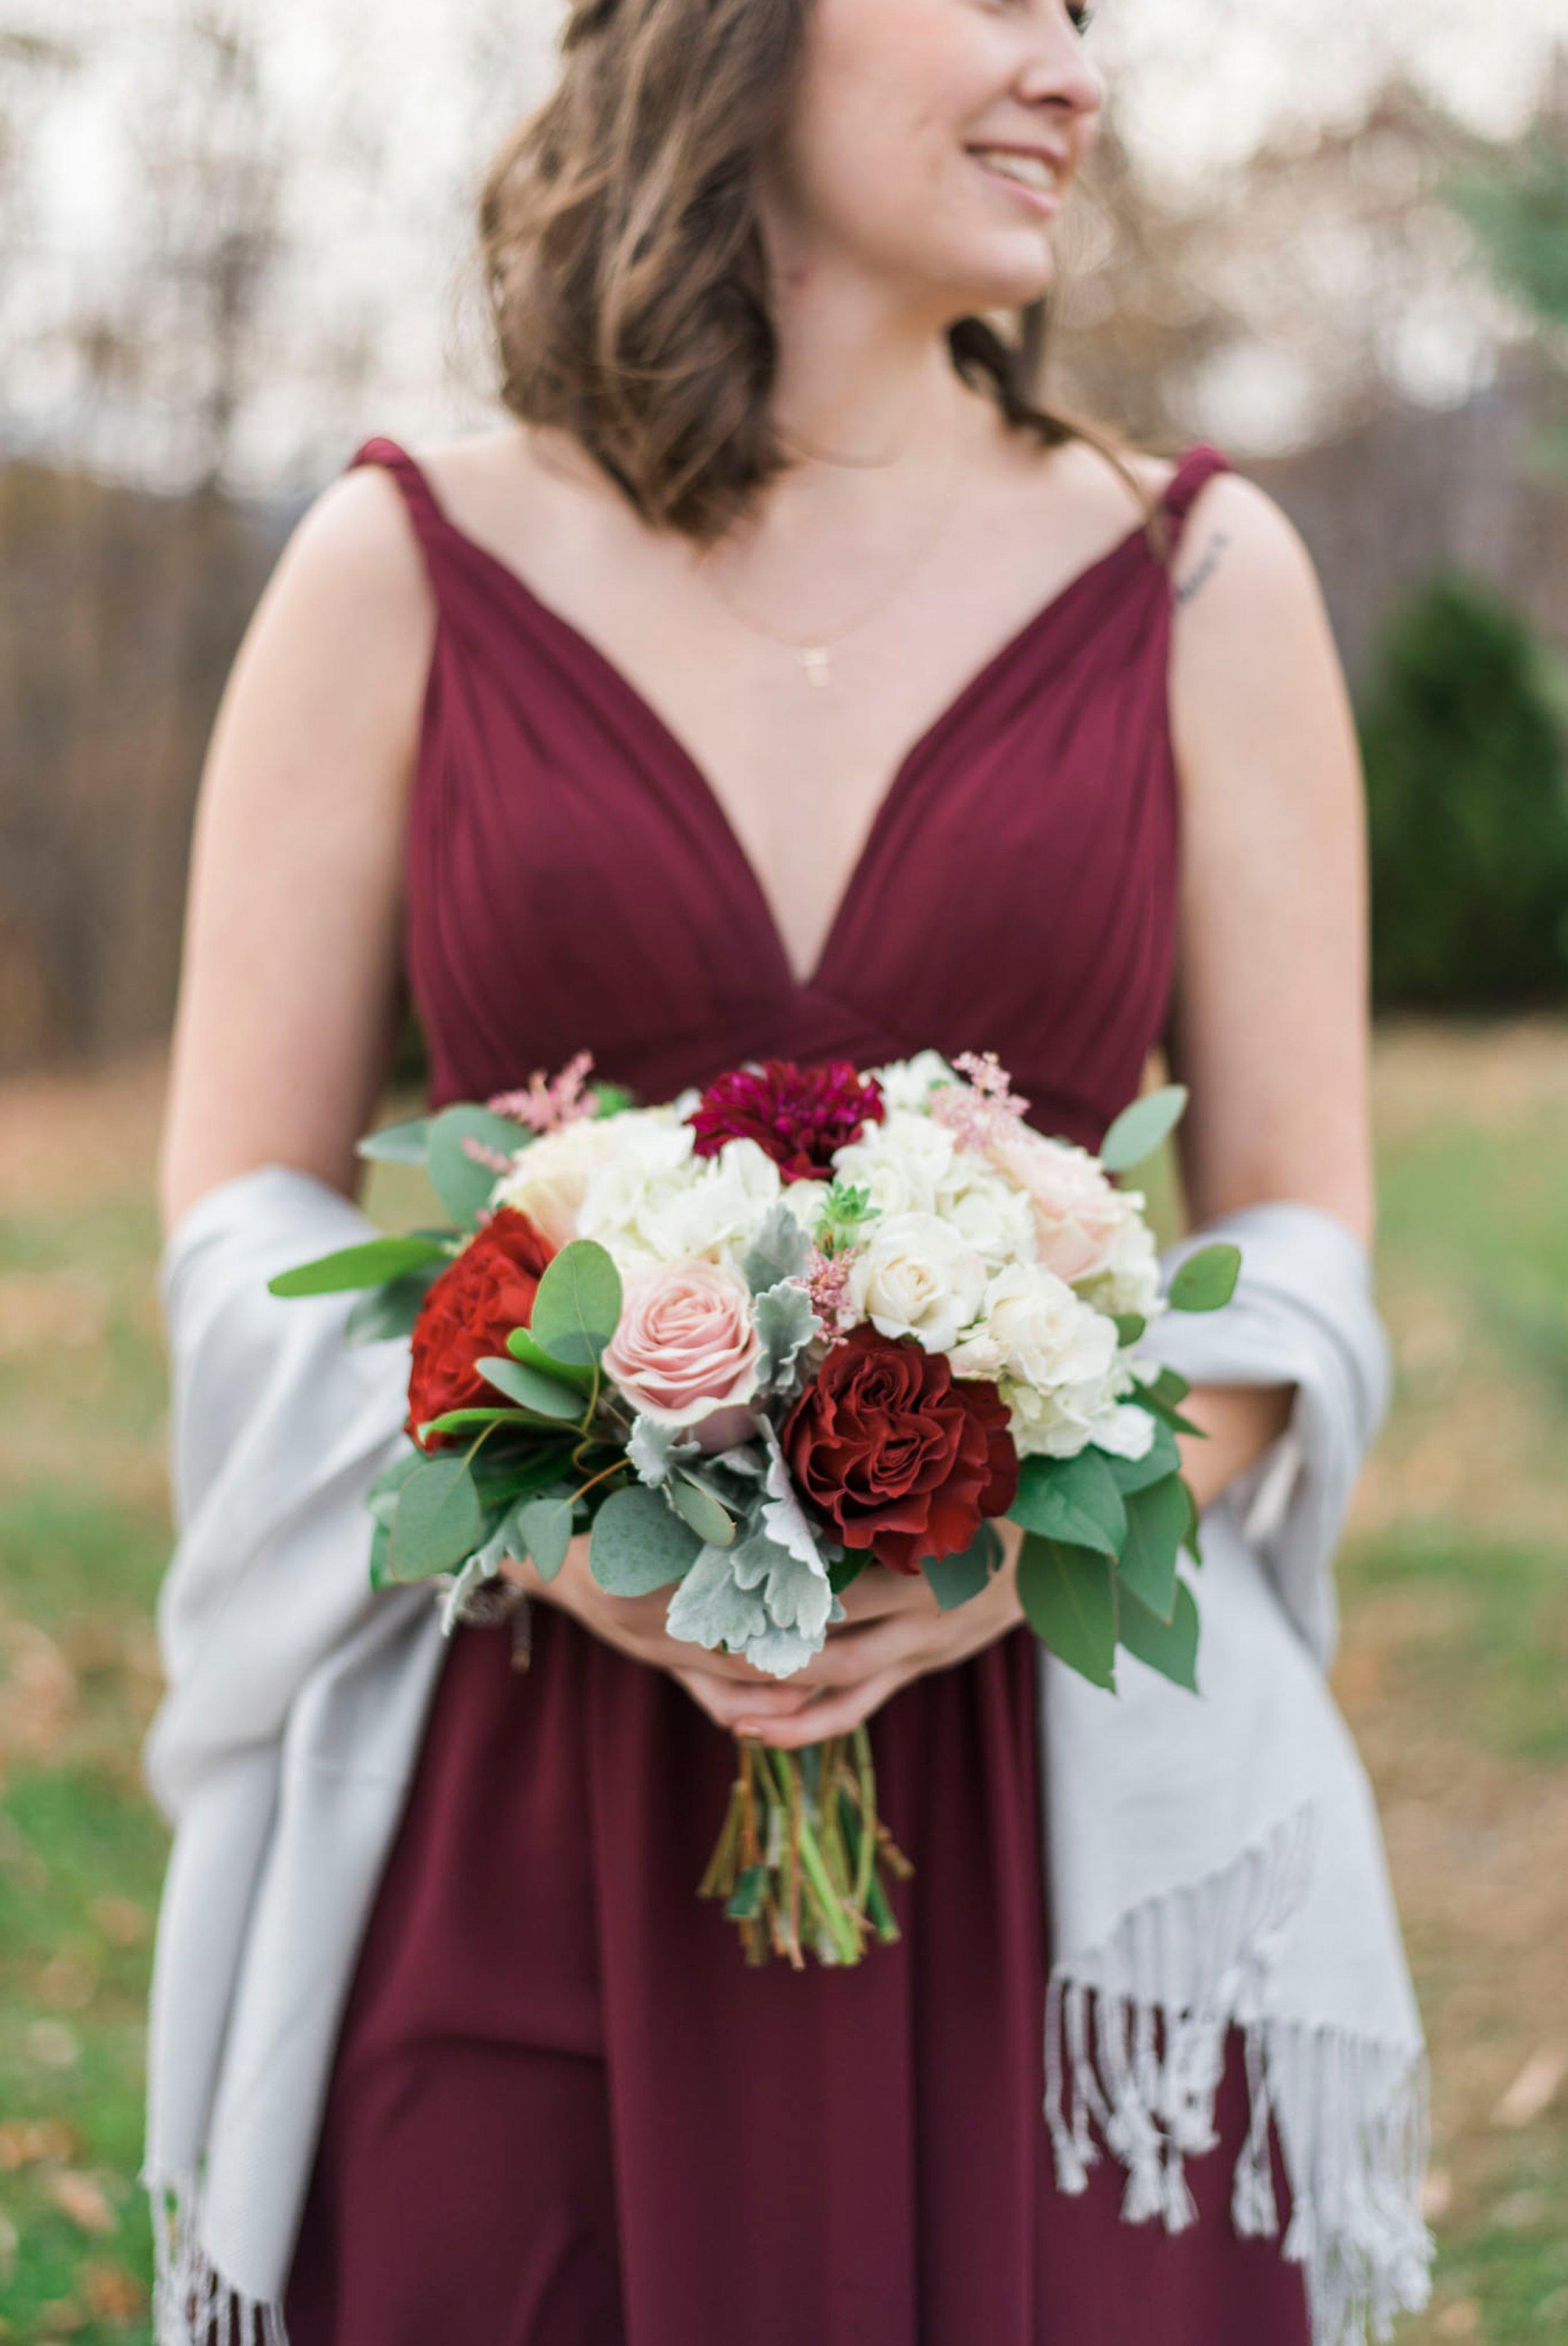 IrvineEstate_LexingtonVA_Wedding_FallWedding_VirginiaWeddingPhotographer 75.jpg